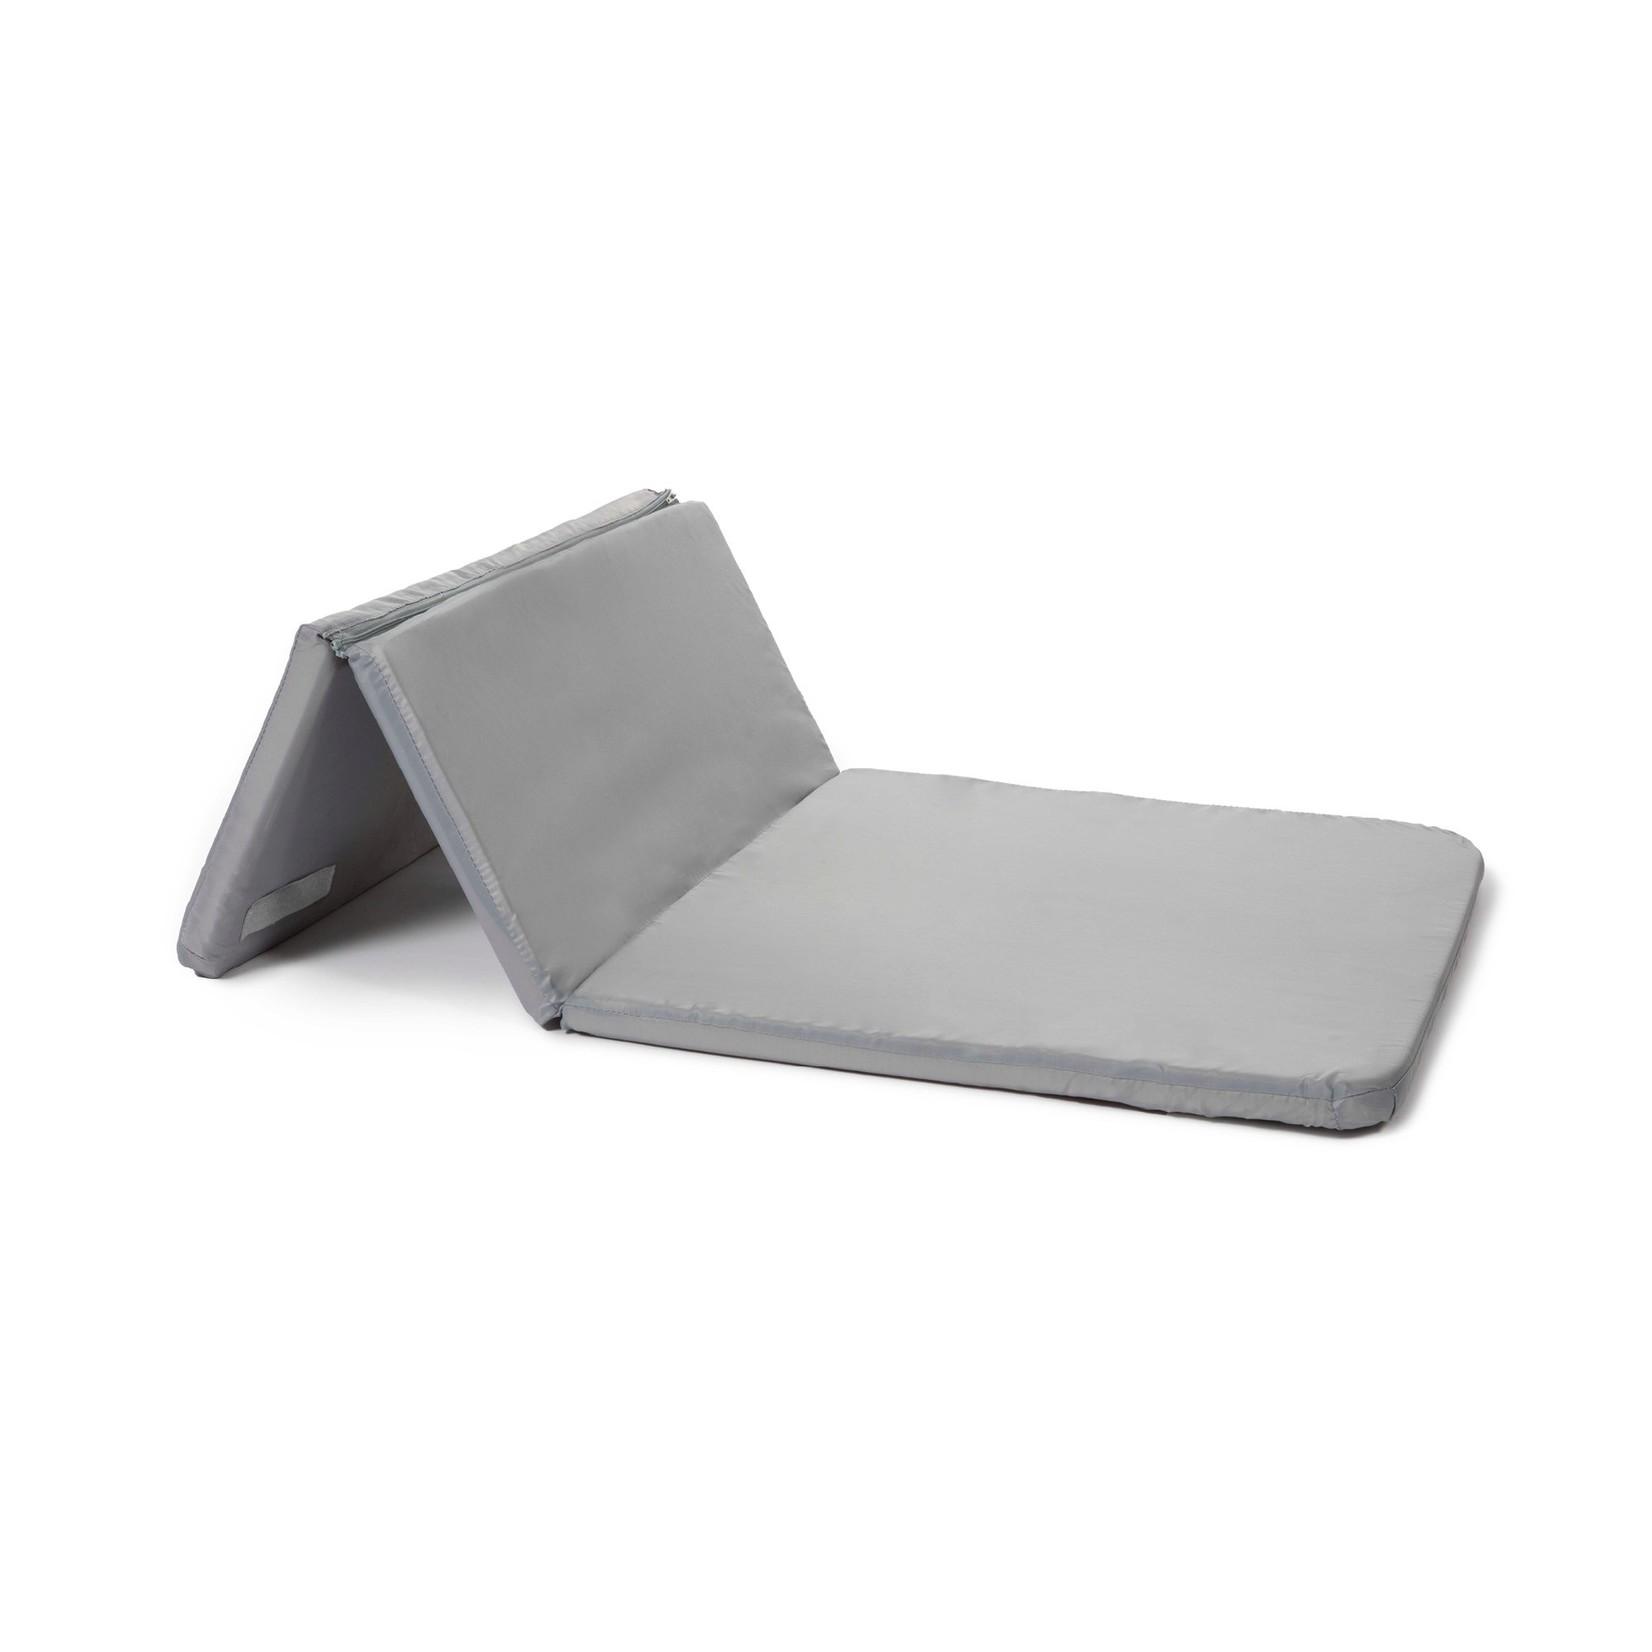 AeroMoov Reisbed Instant travel cot (Grey rock)